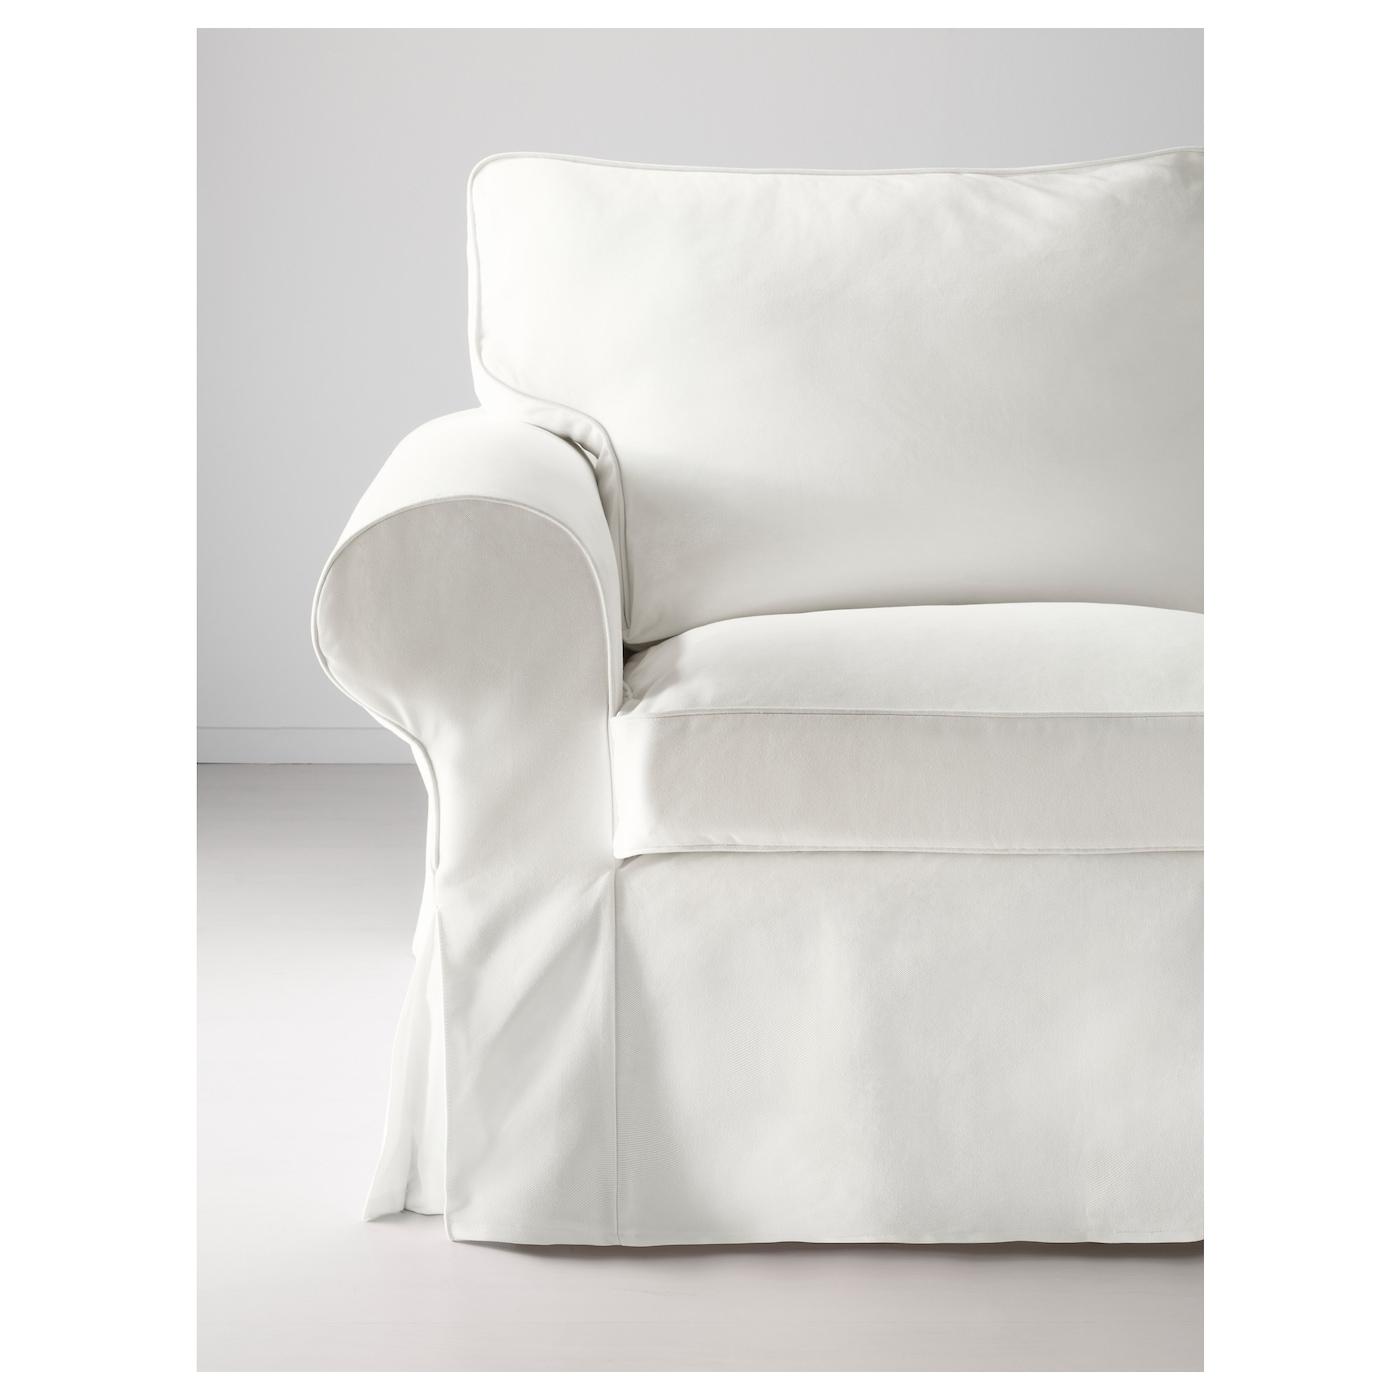 Ikea Hovas Slipcover Latest Goteborg Slipcover In Rouge Ash Grey